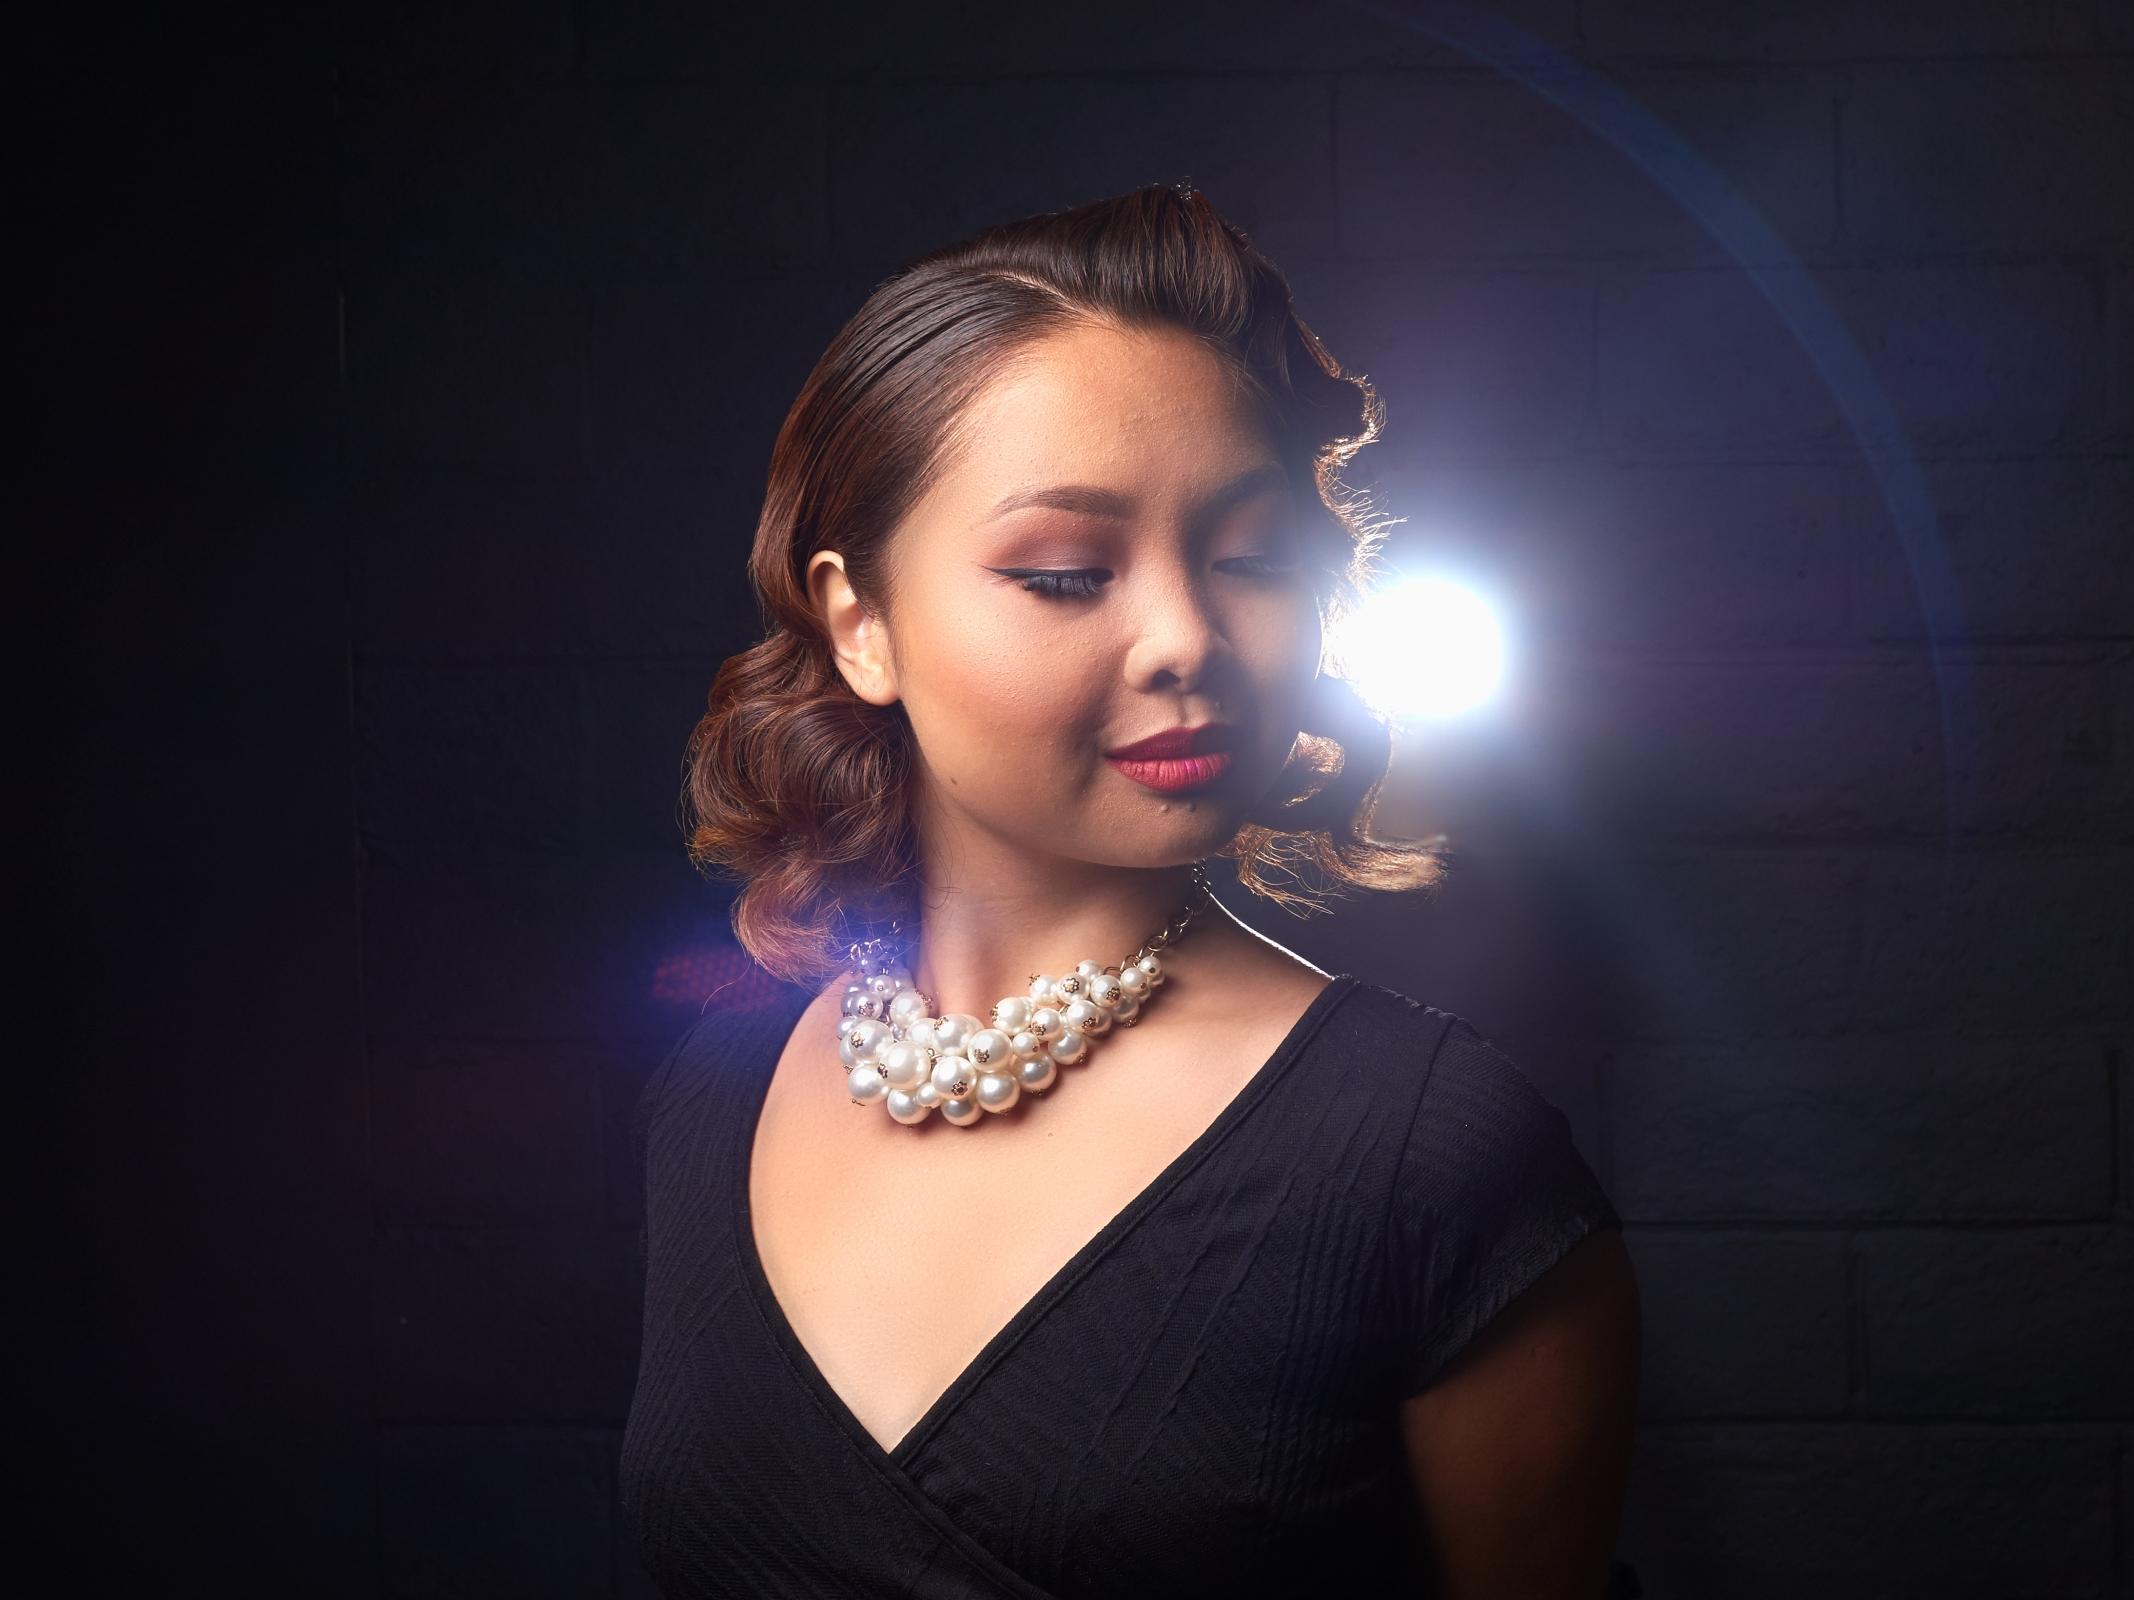 Winnie Portrait shot with light flare